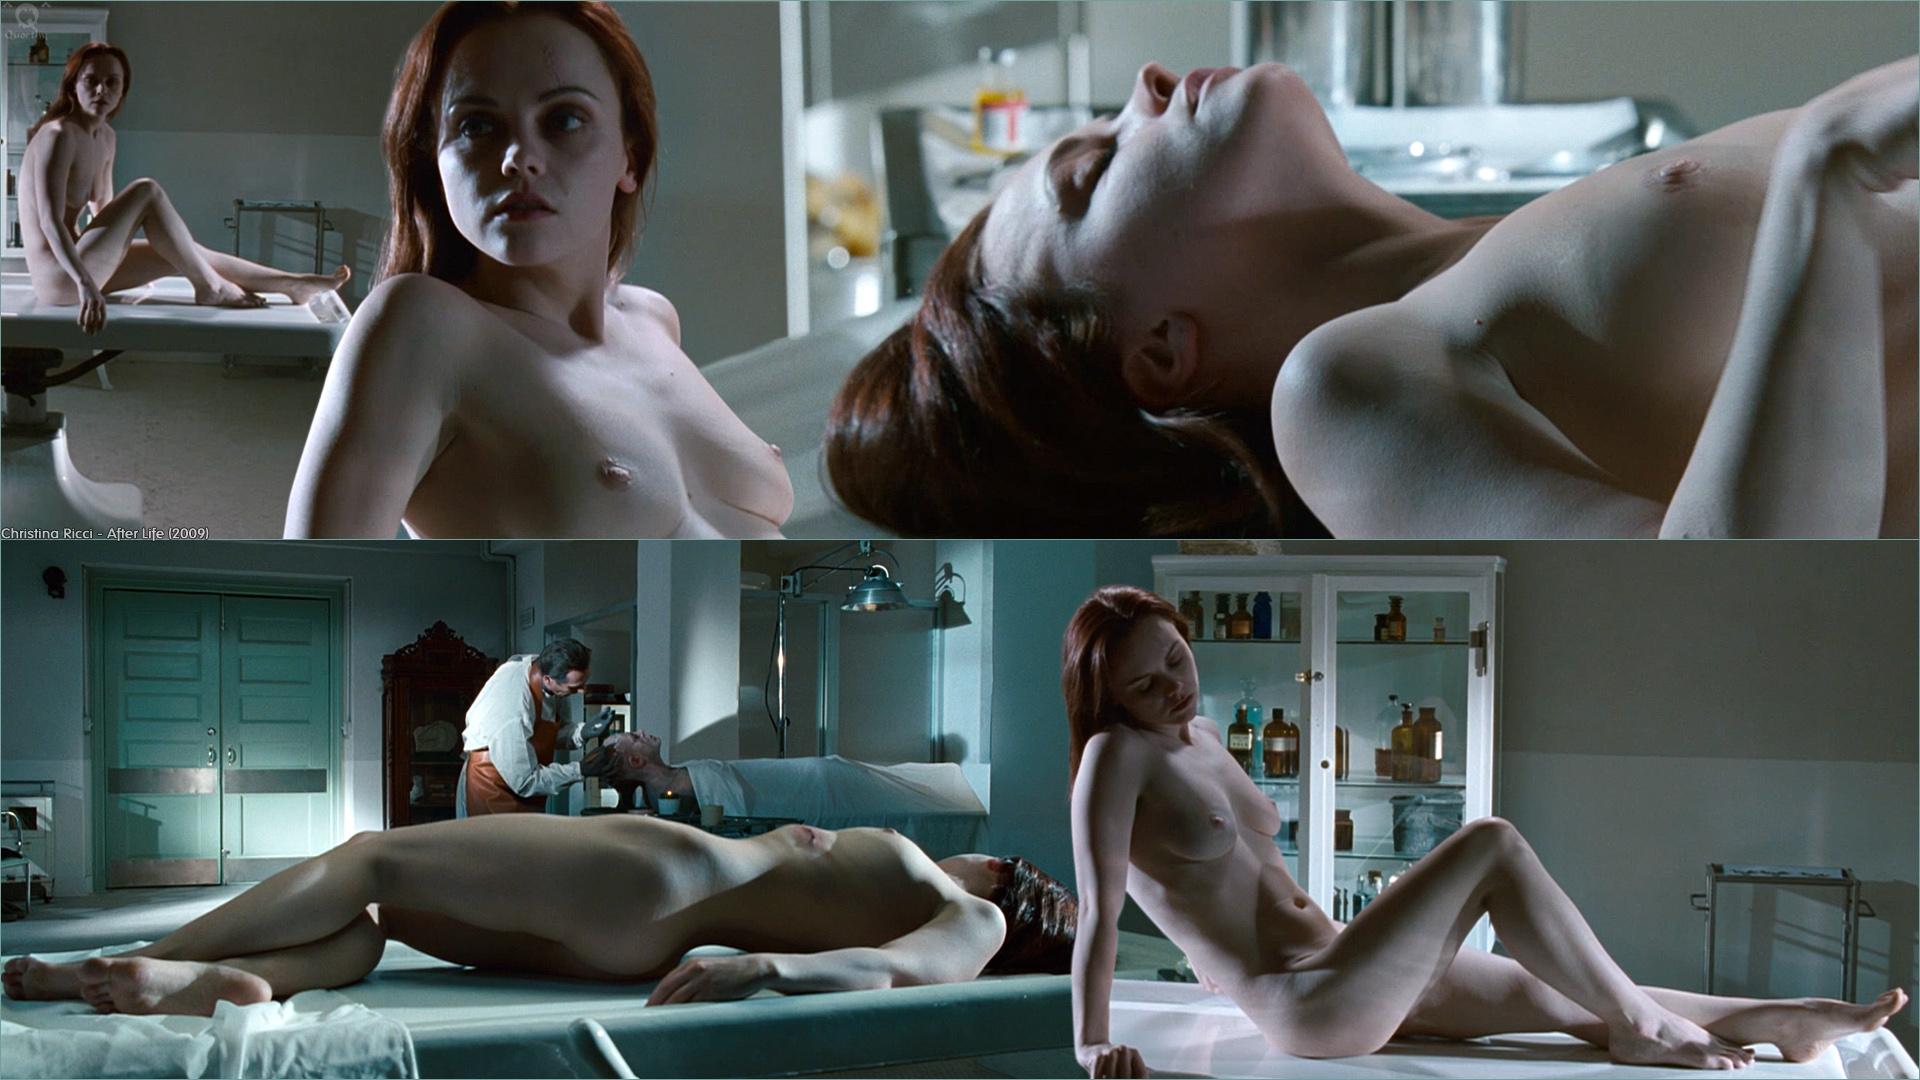 Pregnant arab woman nude